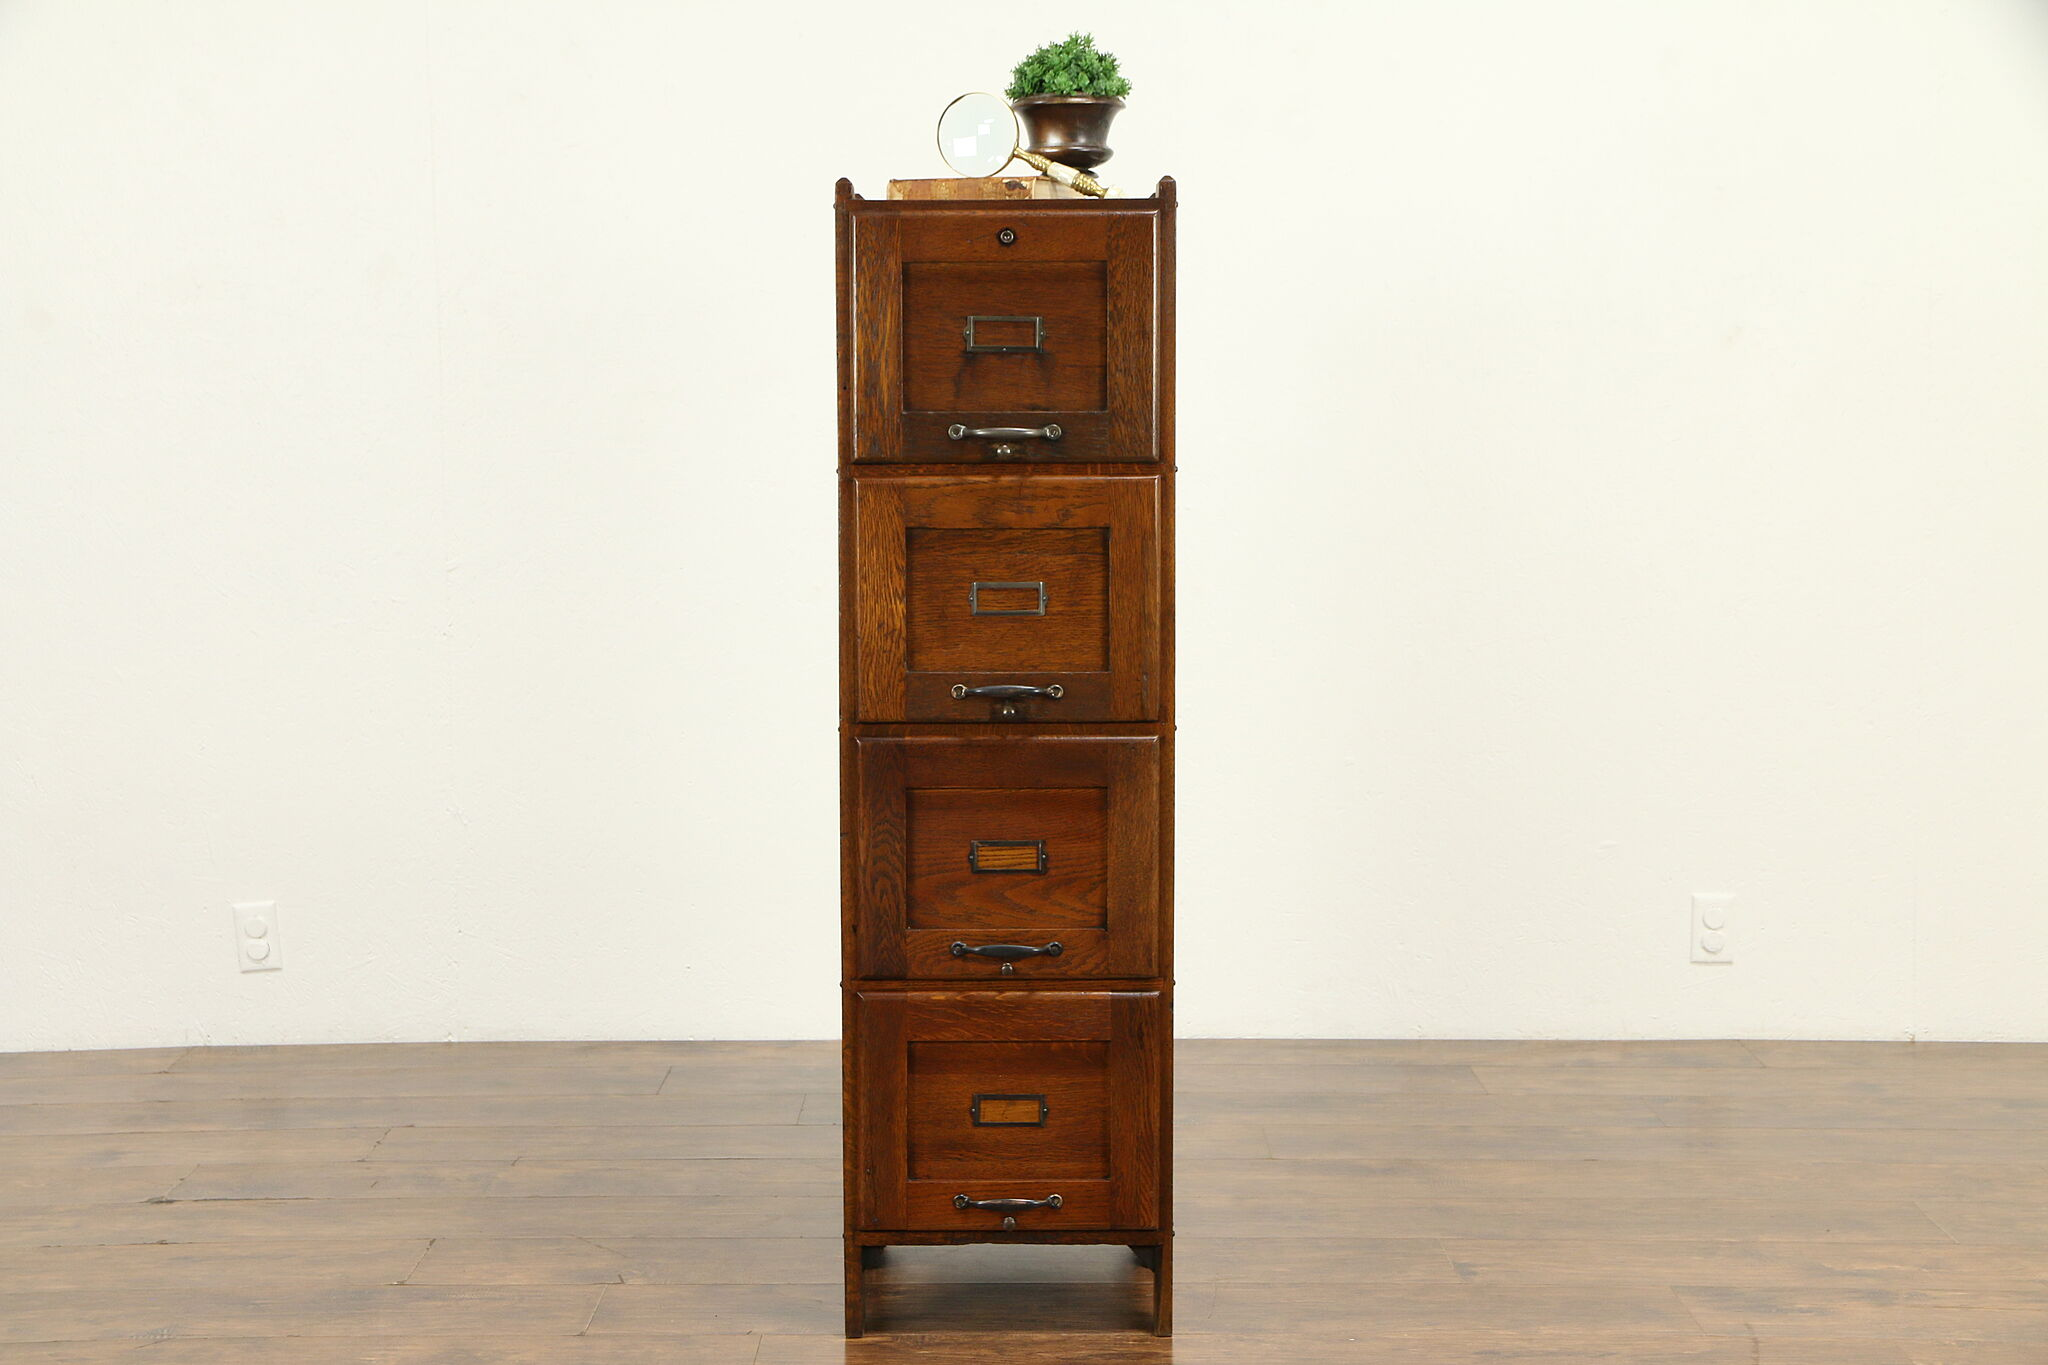 Picture of: Sold Mission Oak Arts Crafts 4 Drawer Antique 1910 Craftsman File Cabinet 32059 Harp Gallery Antiques Furniture